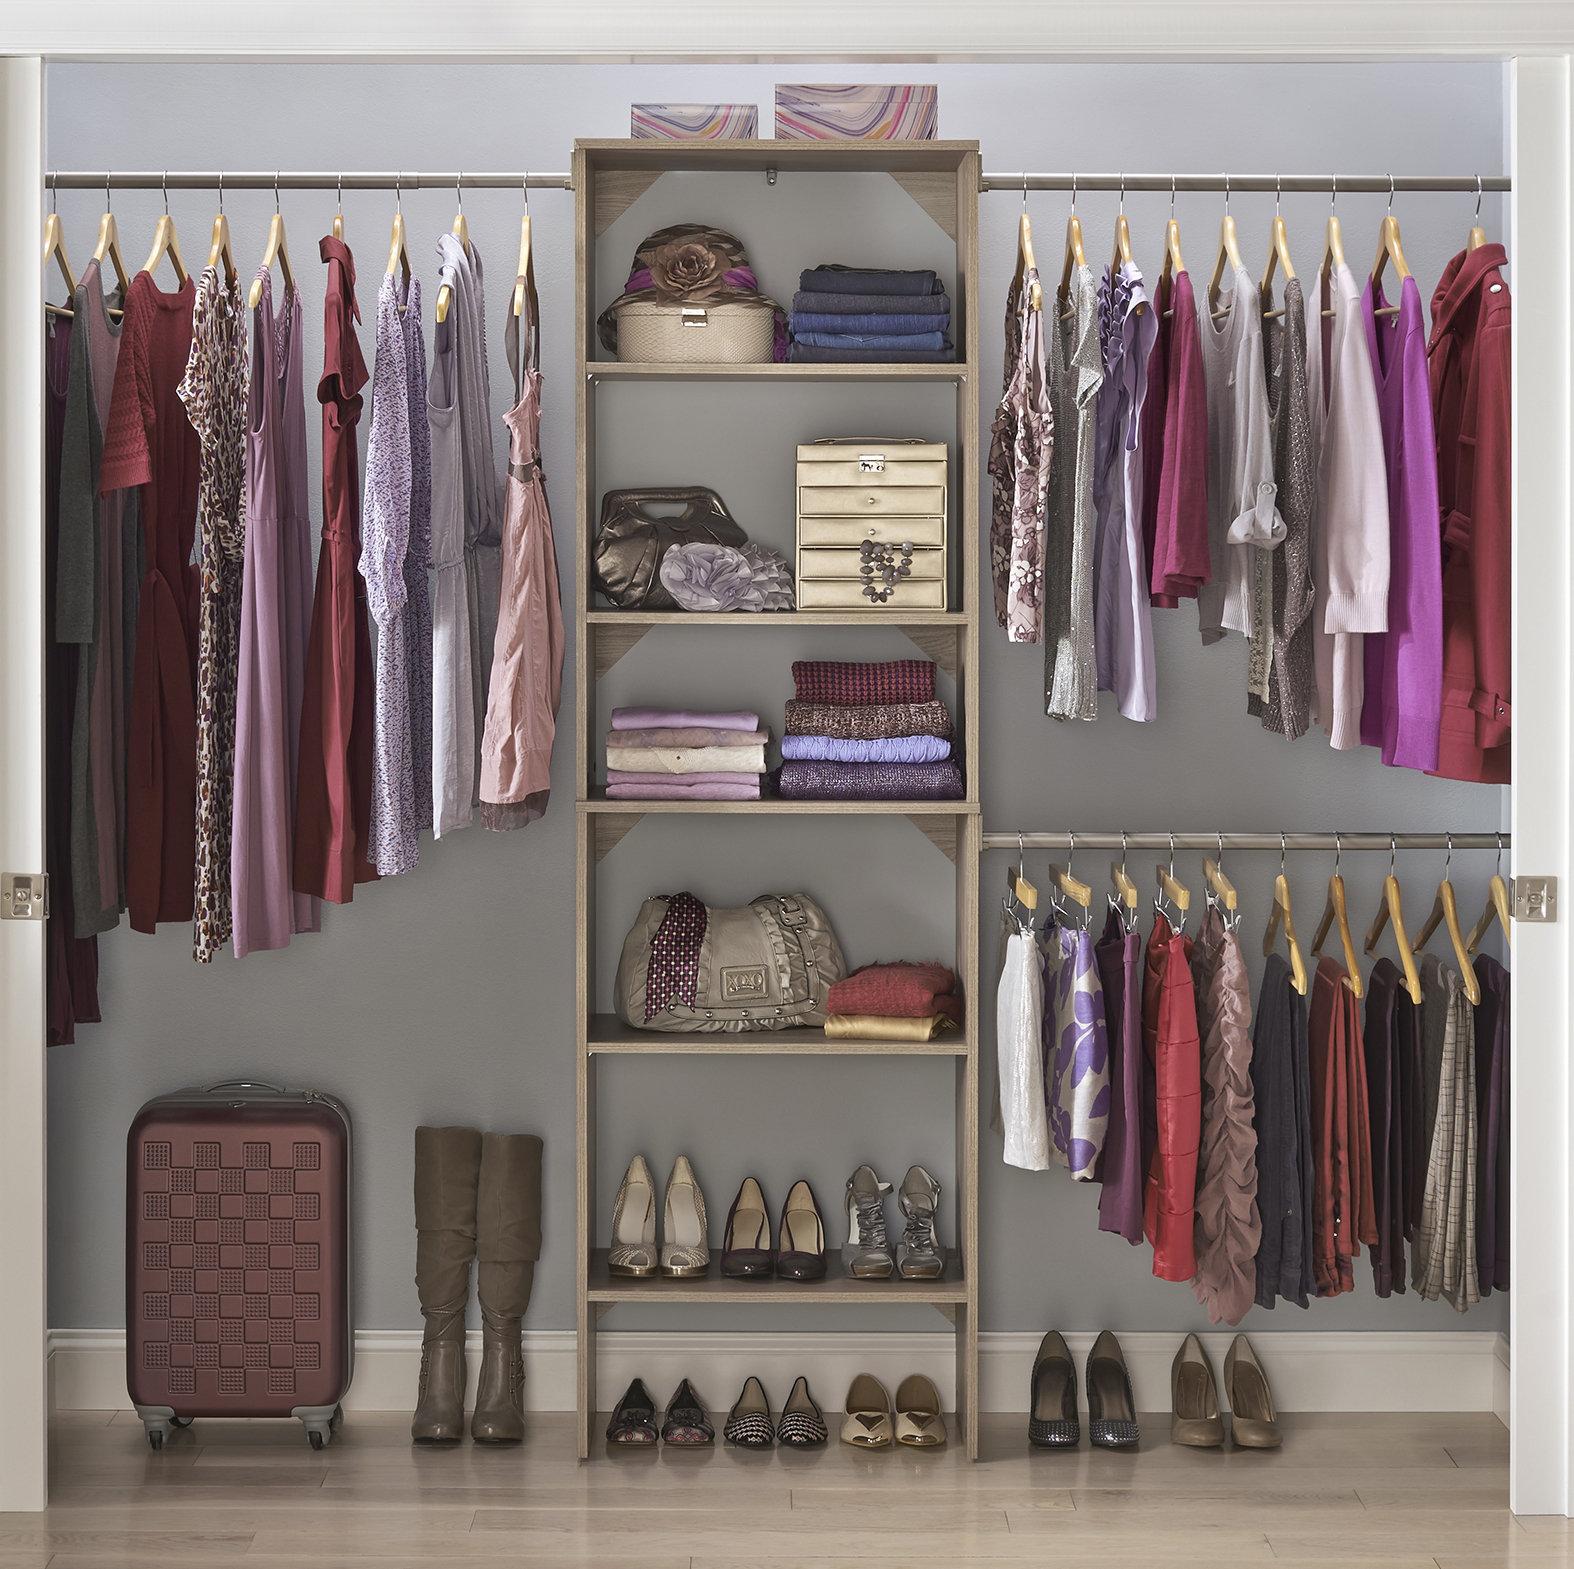 w closetmaid reviews closet suitesymphony pdx wayfair storage system organization